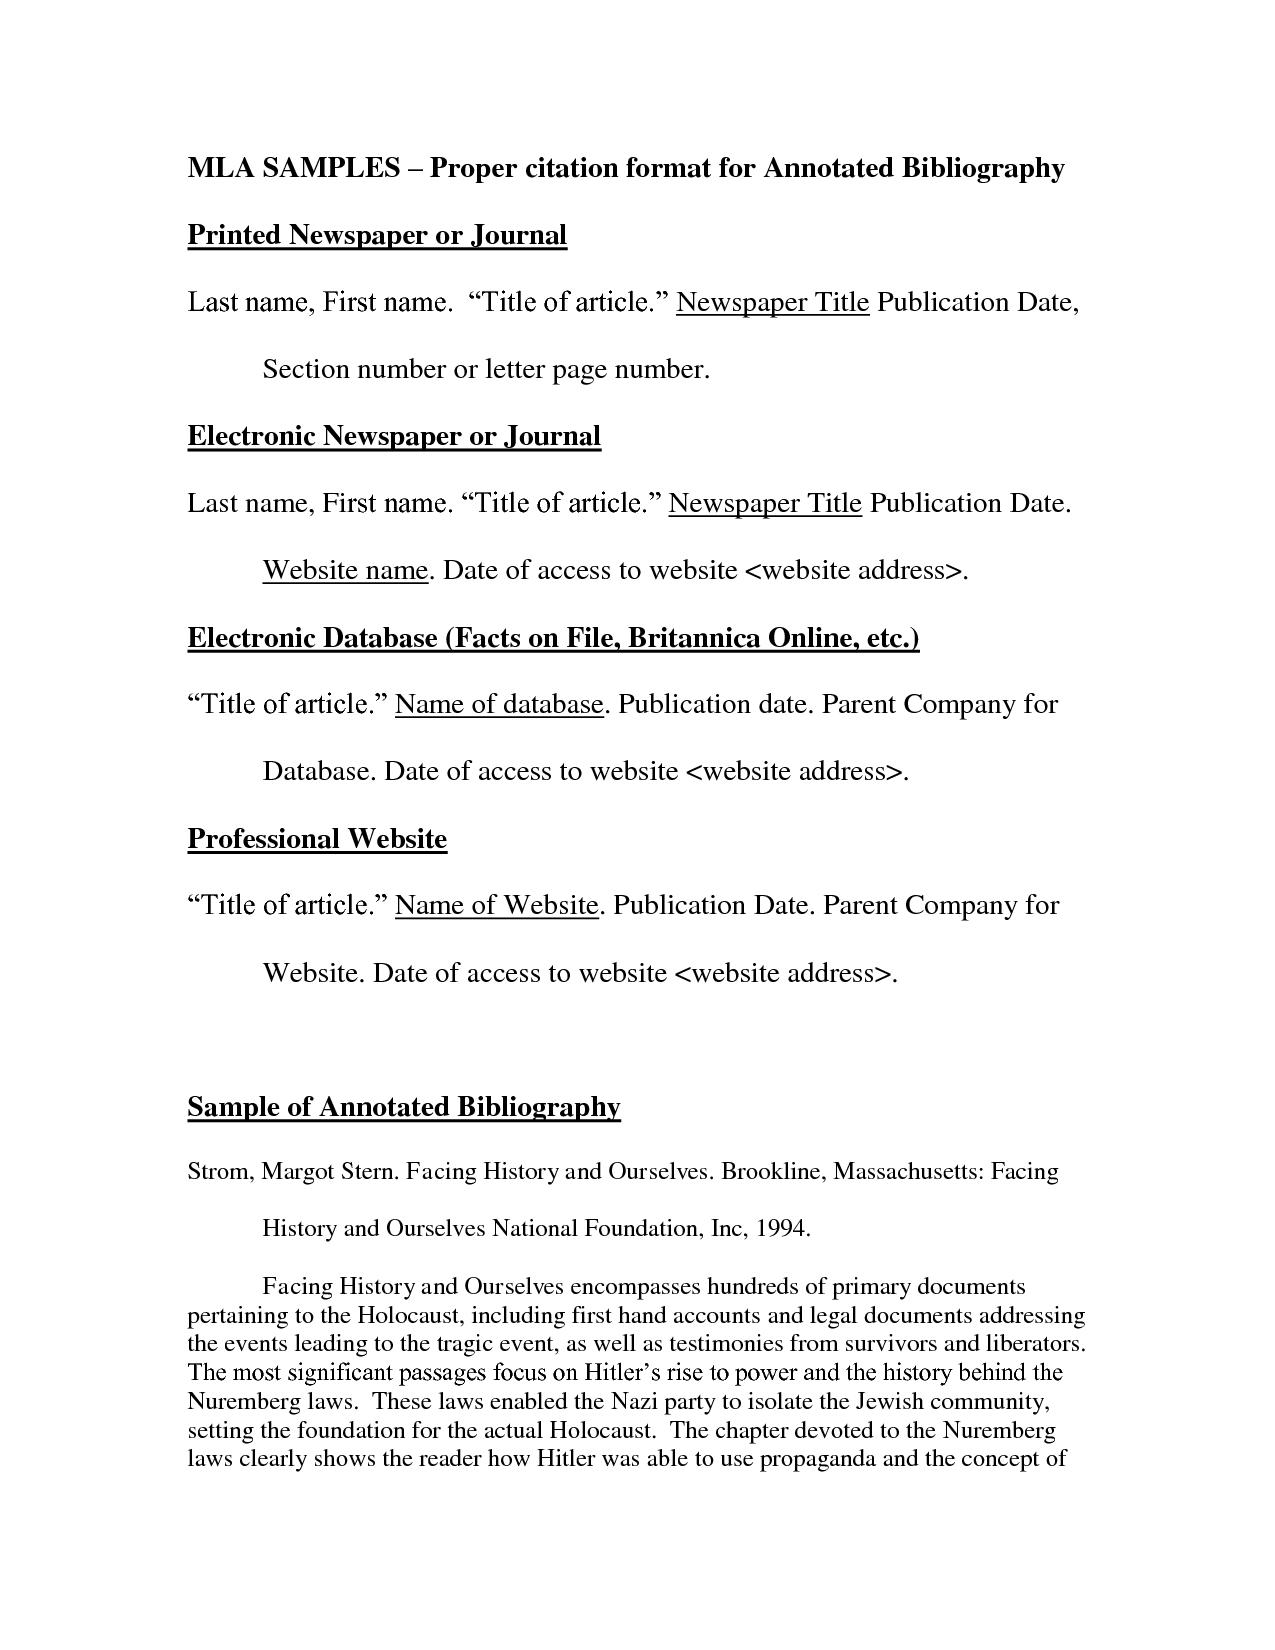 Bibliography clipart table contents. Proper incep imagine ex